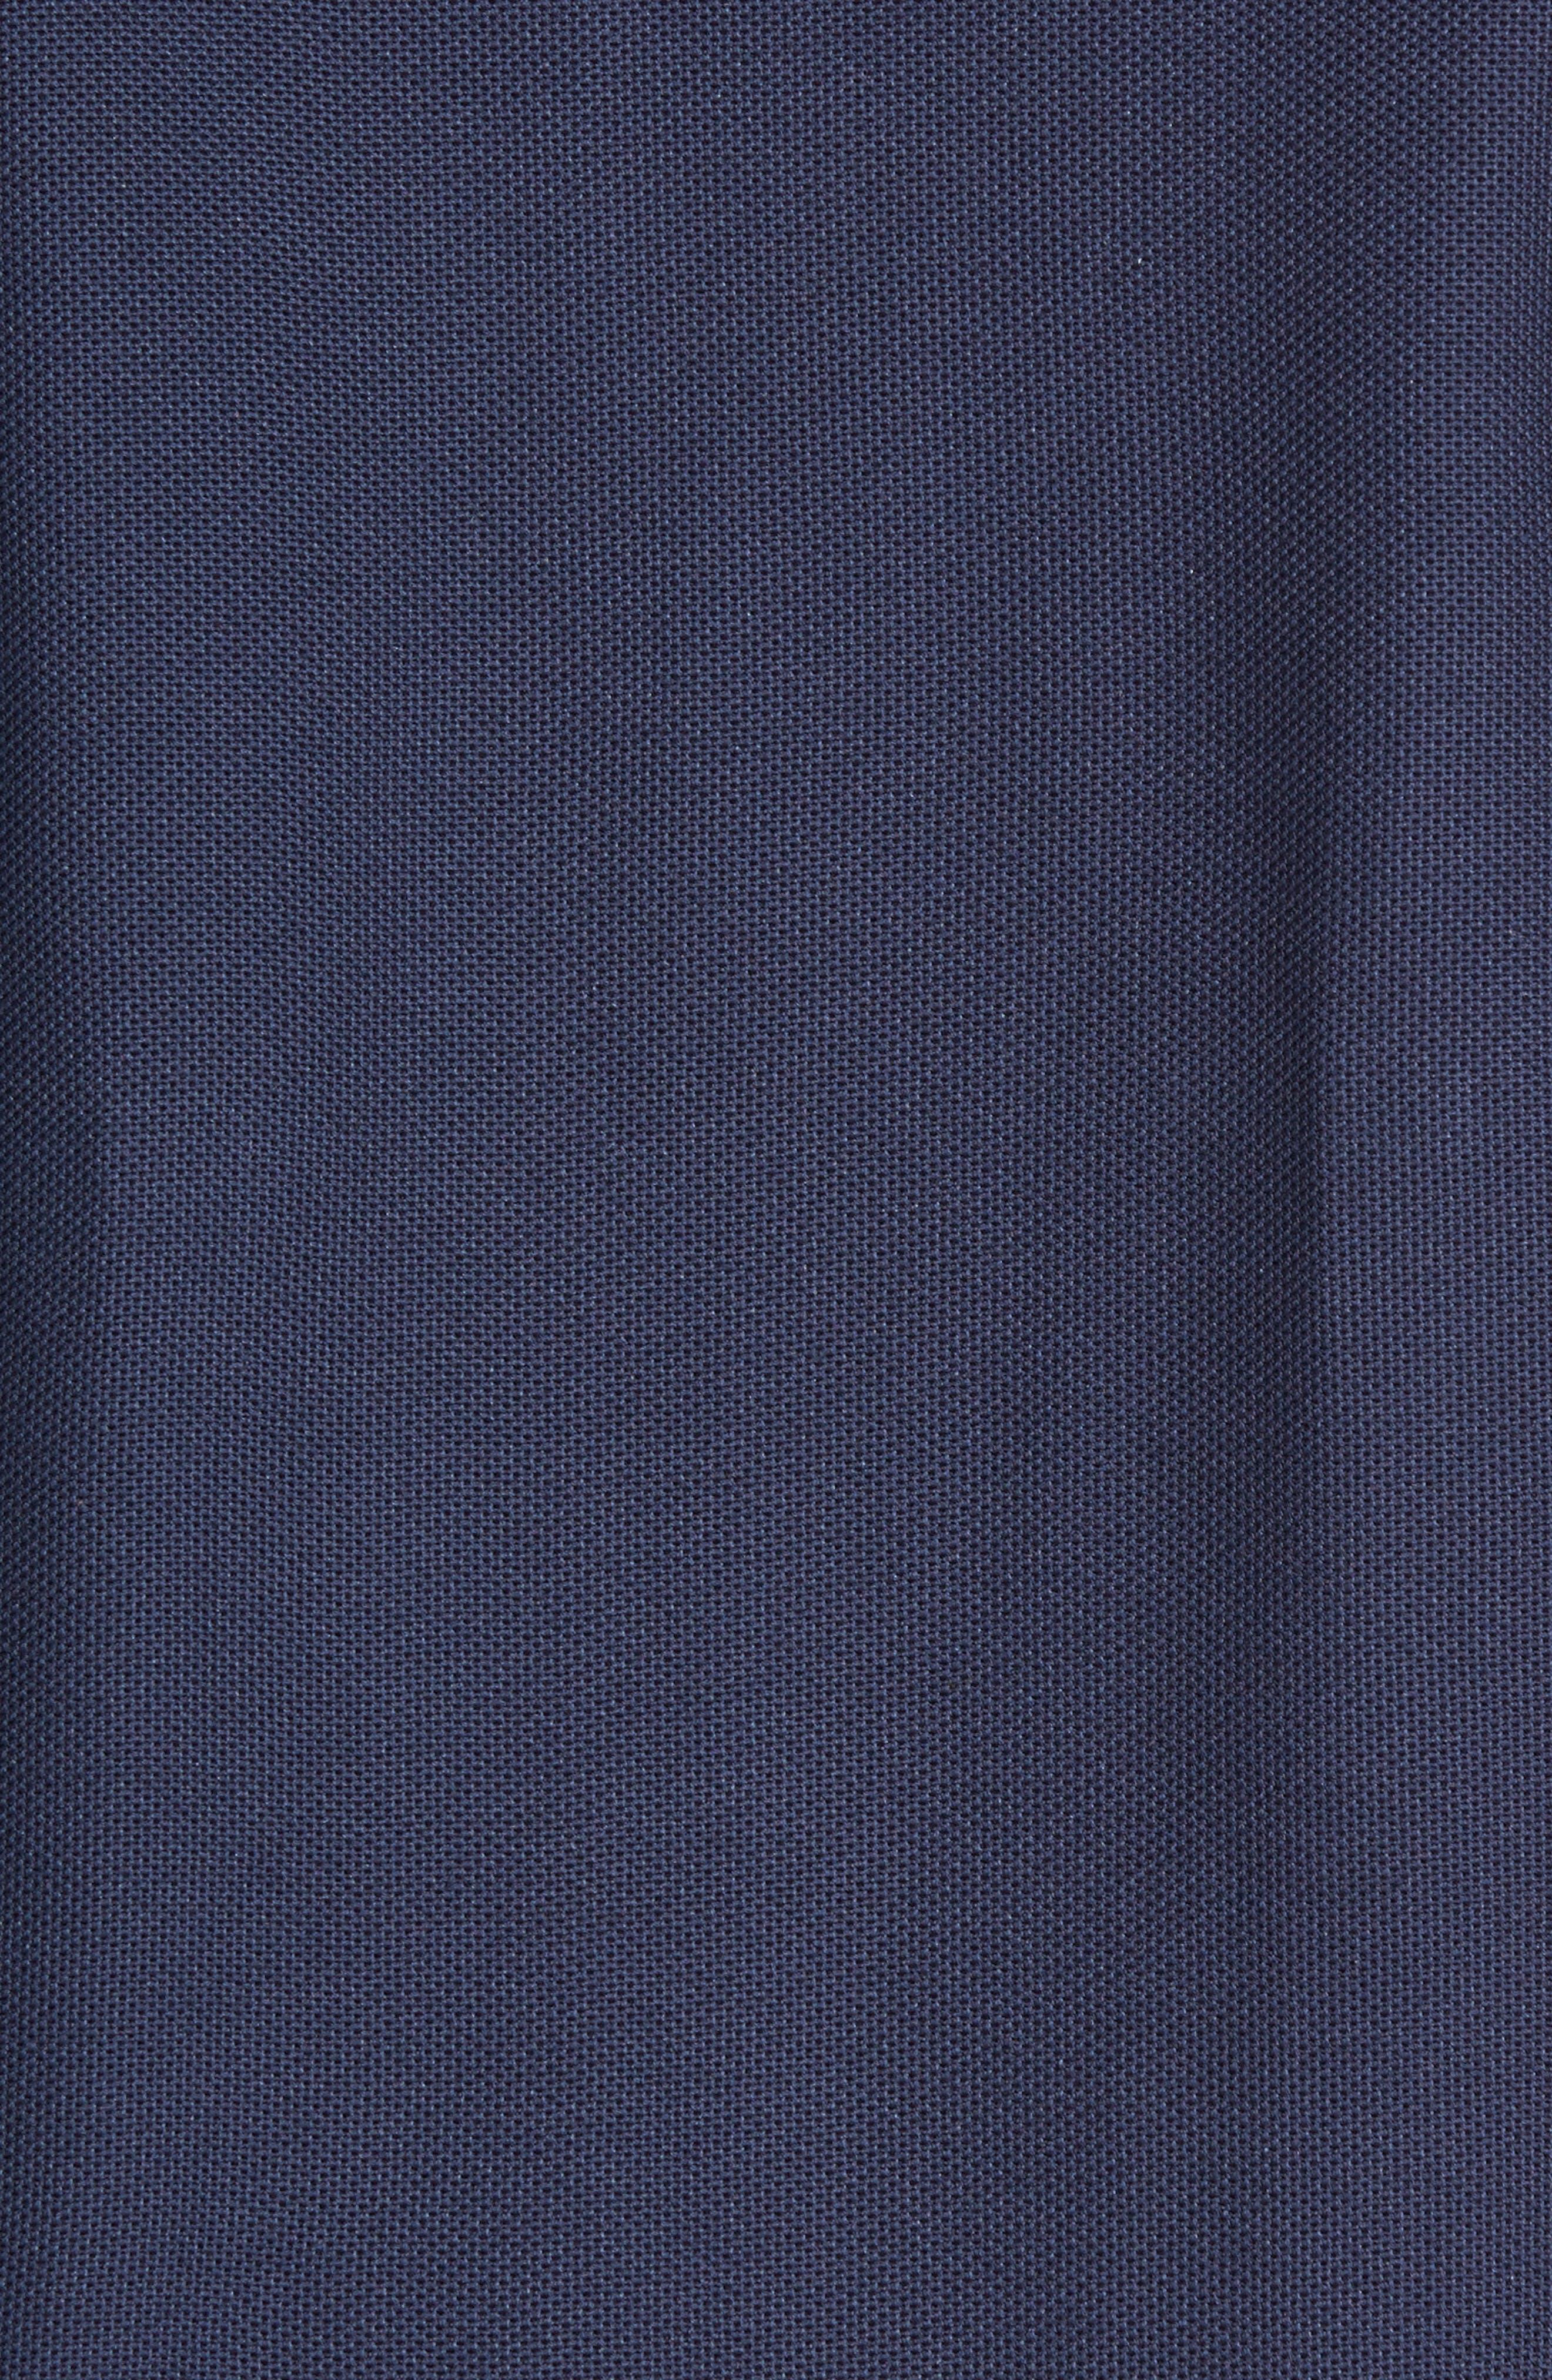 TOMMY BAHAMA, The Emfielder Piqué Polo, Alternate thumbnail 3, color, BLUE NOTE